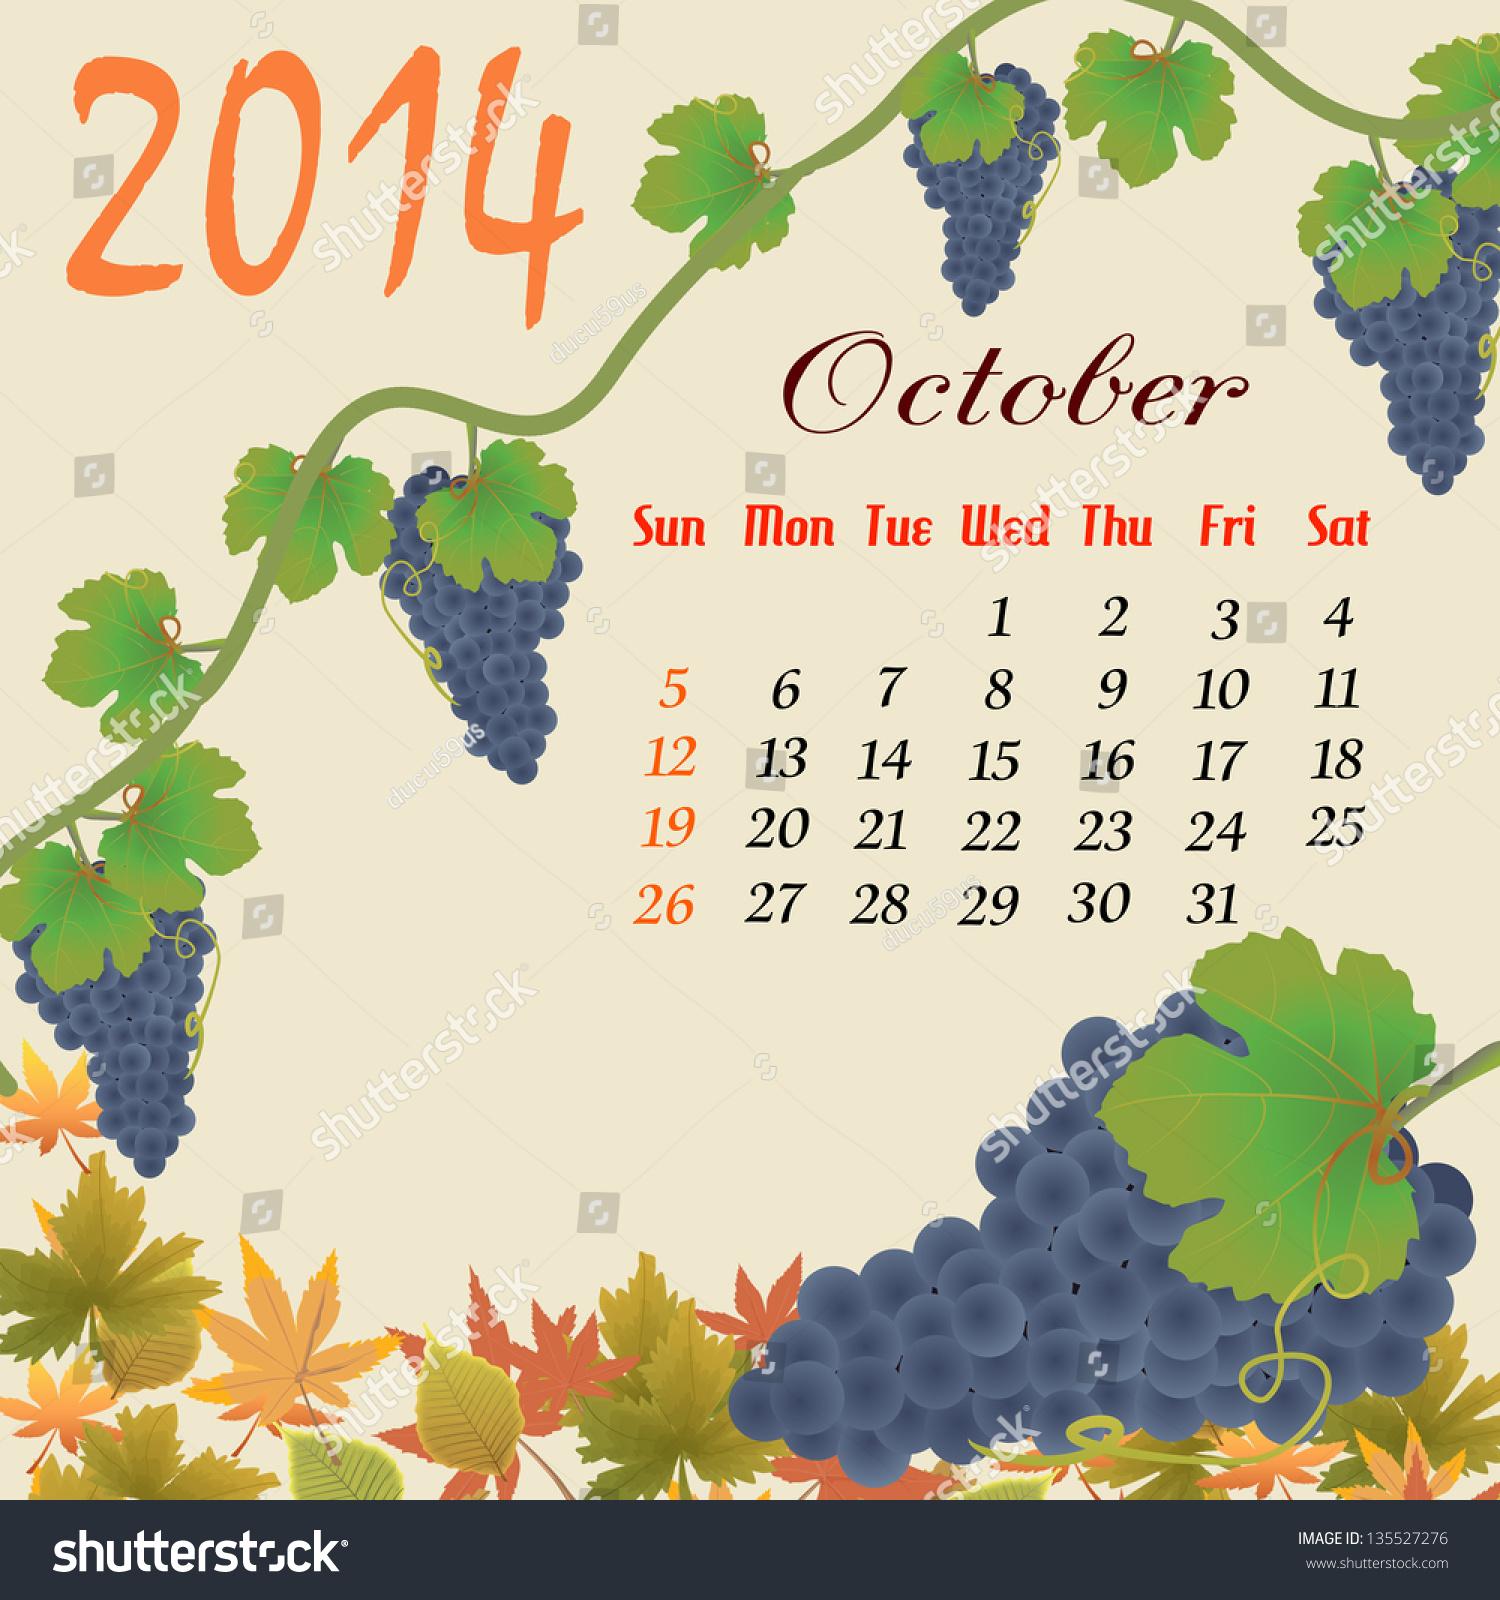 October Calendar Illustration : Calendar october grapes leaves vector stock